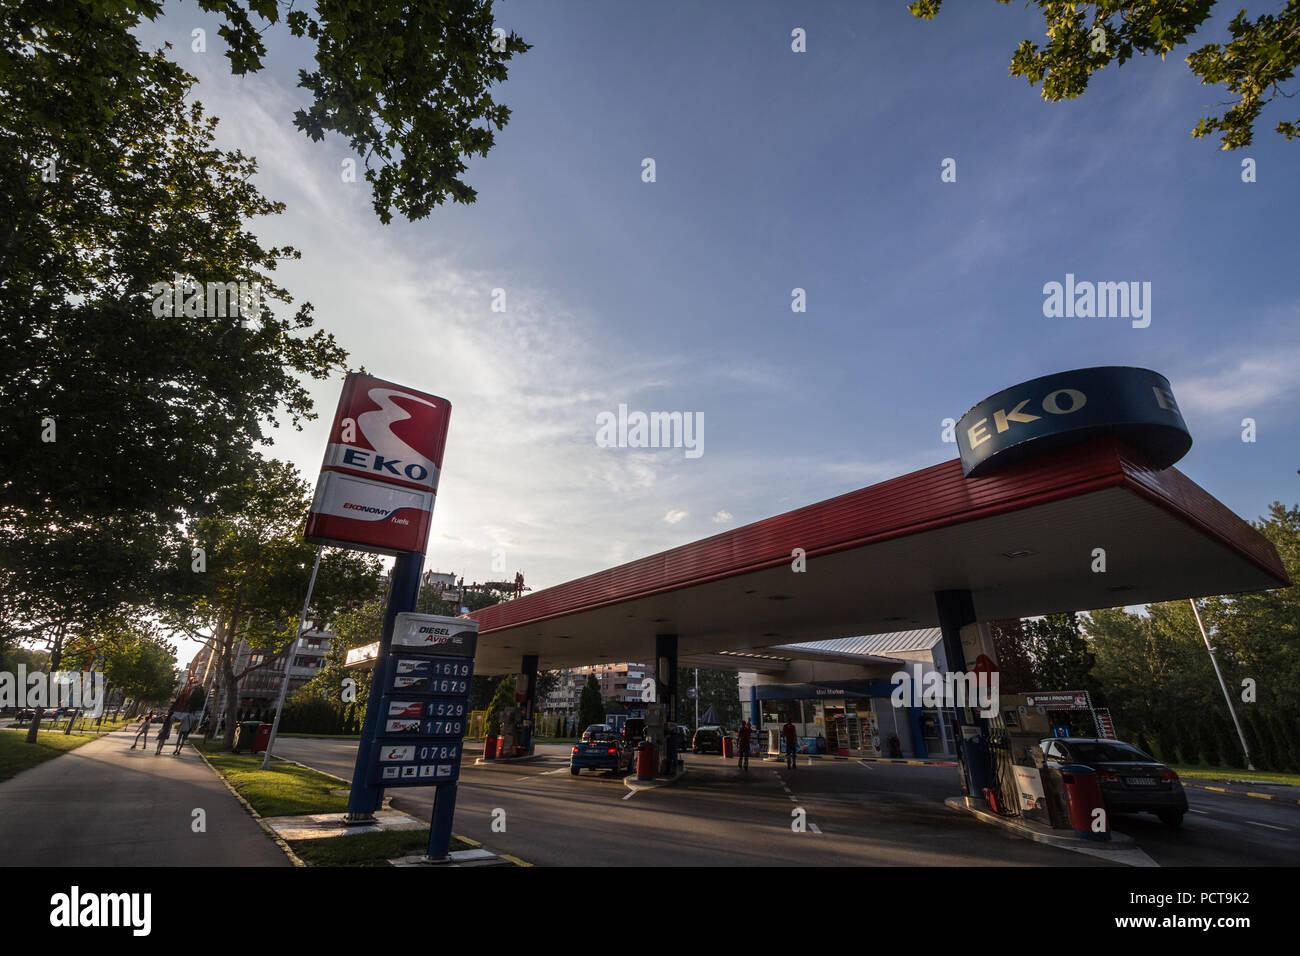 BELGRADE, SERBIA - JULY 26, 2018: EKO logo on their gas station in New Belgrade. Member of Hellenic Petroleum, EKO is the main petrol stations and ene - Stock Image